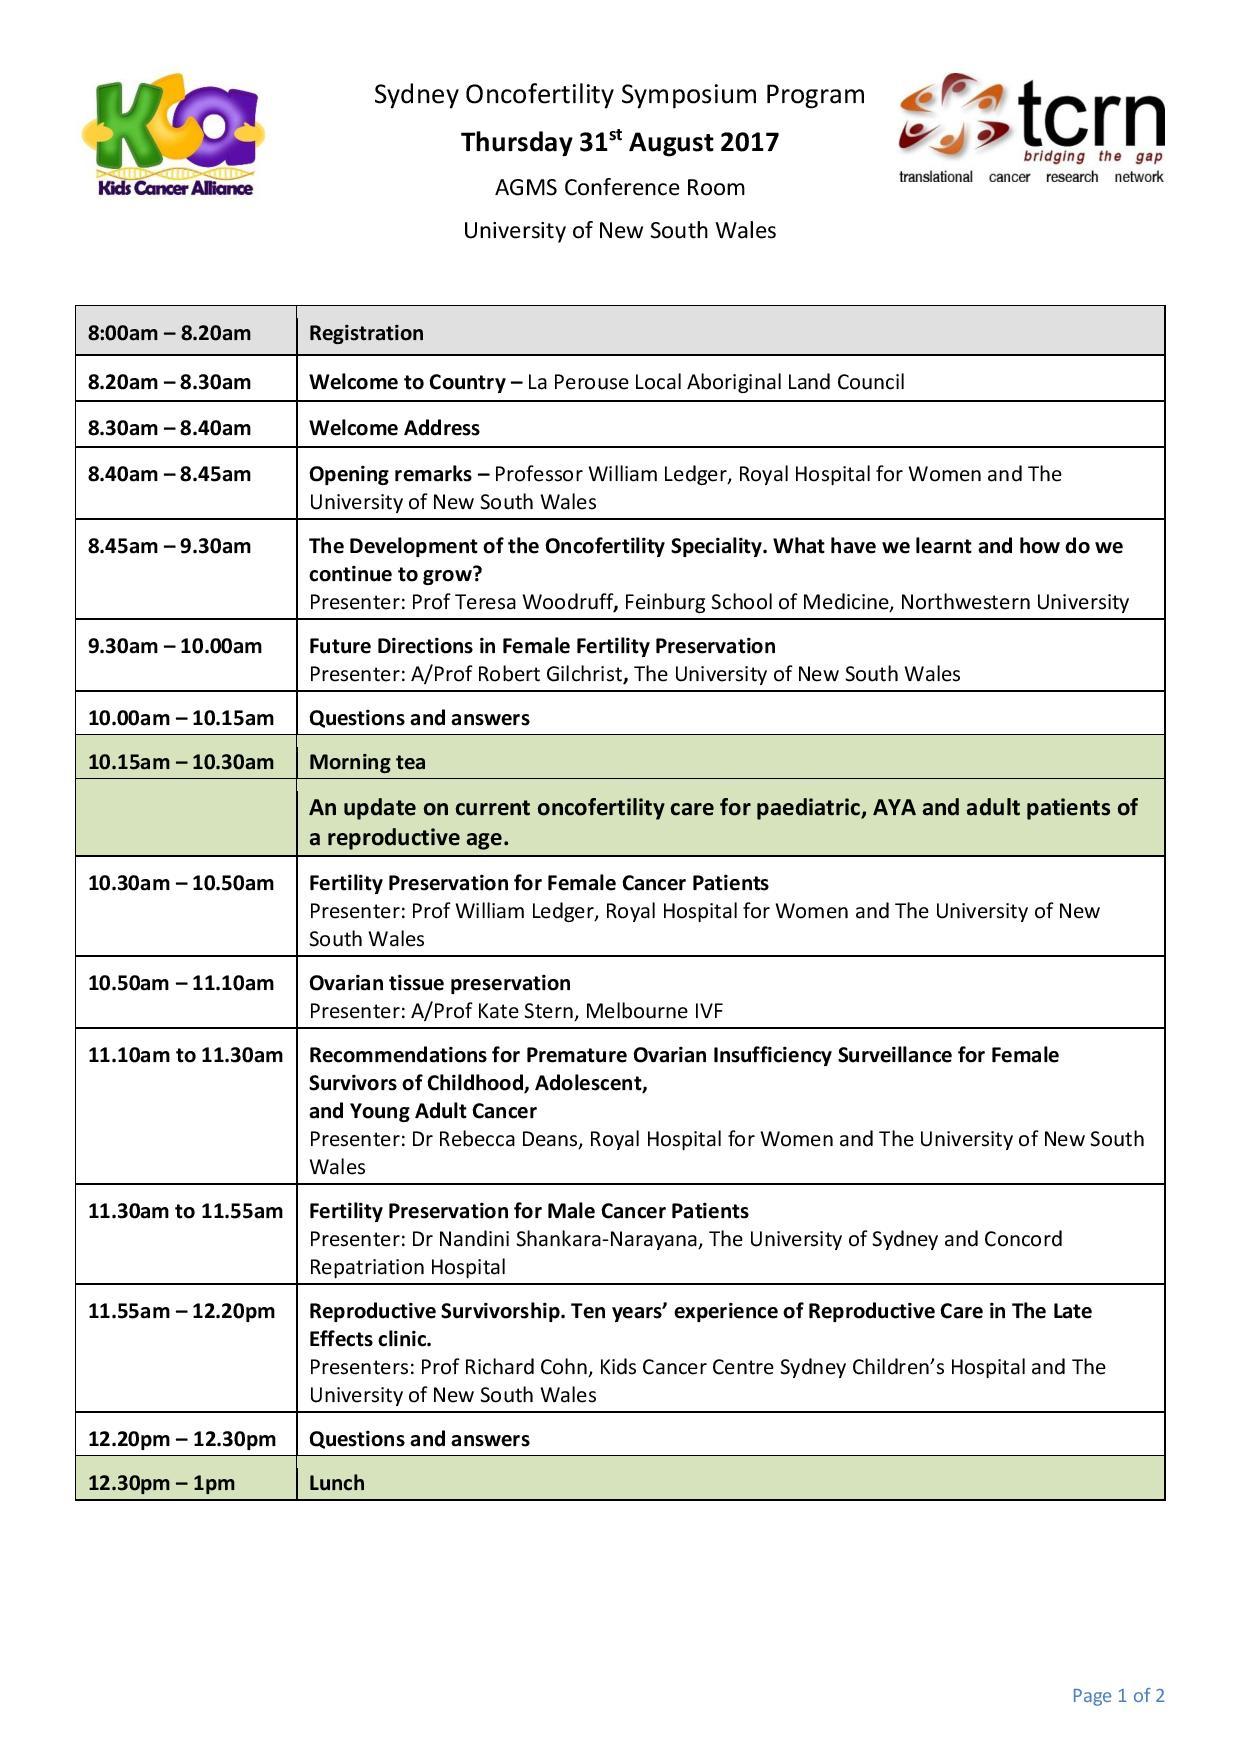 page 1 Oncofertility Symposium program jpeg